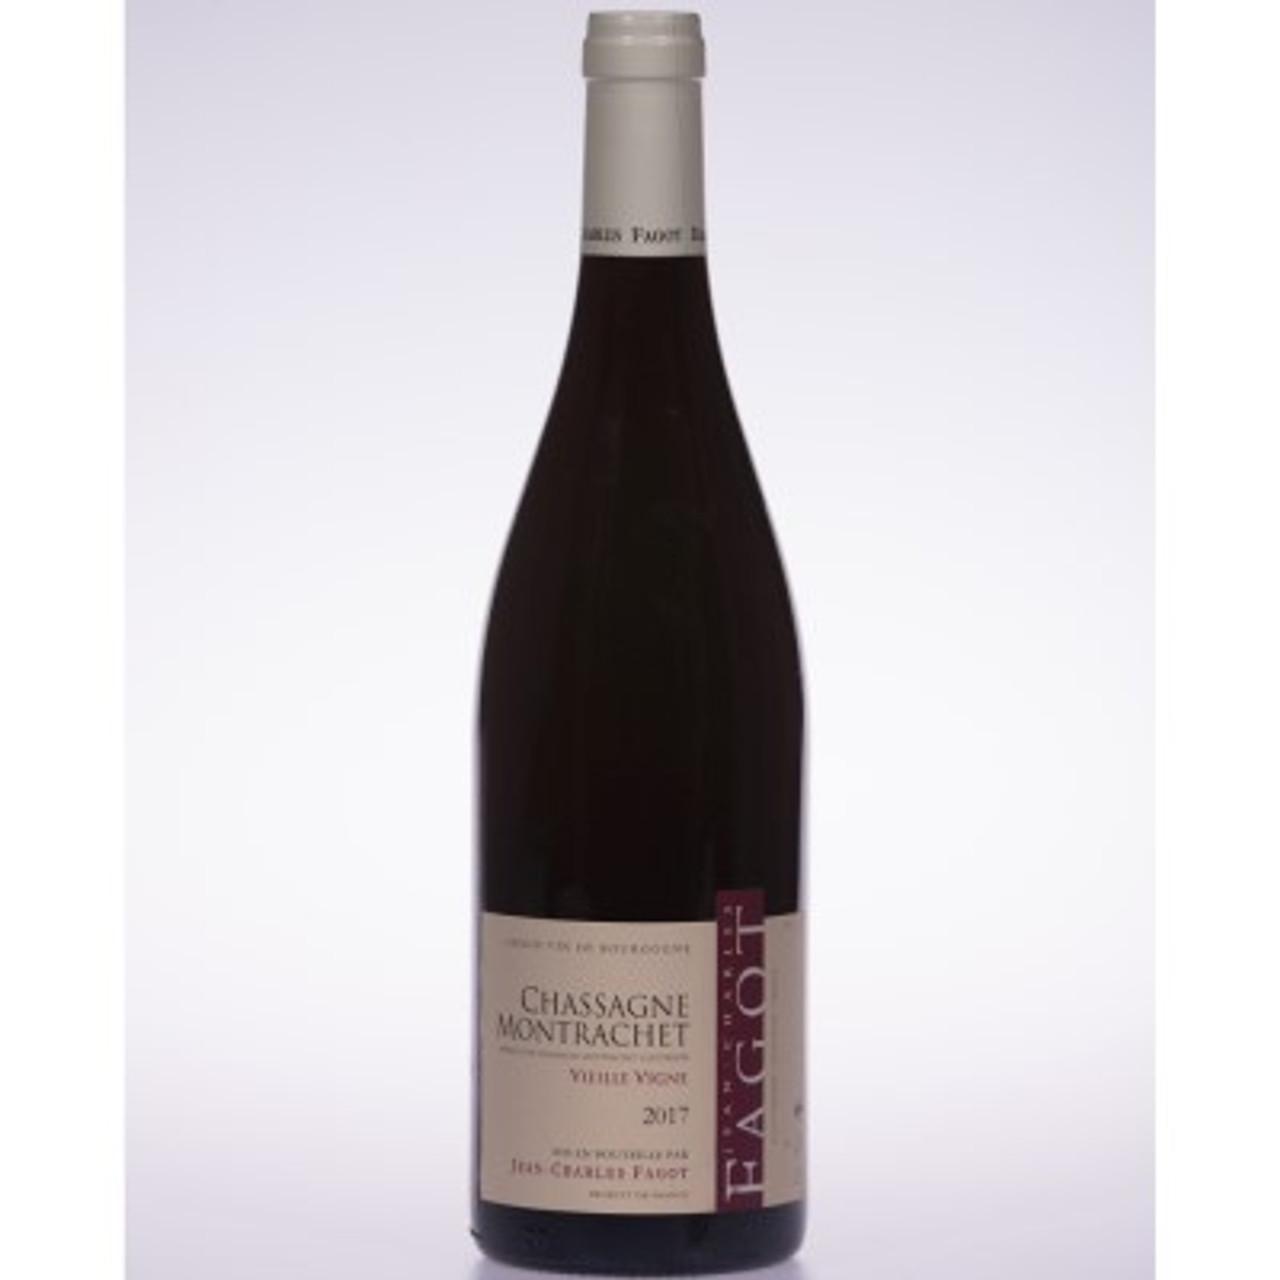 Chassagne-Montrachet Red